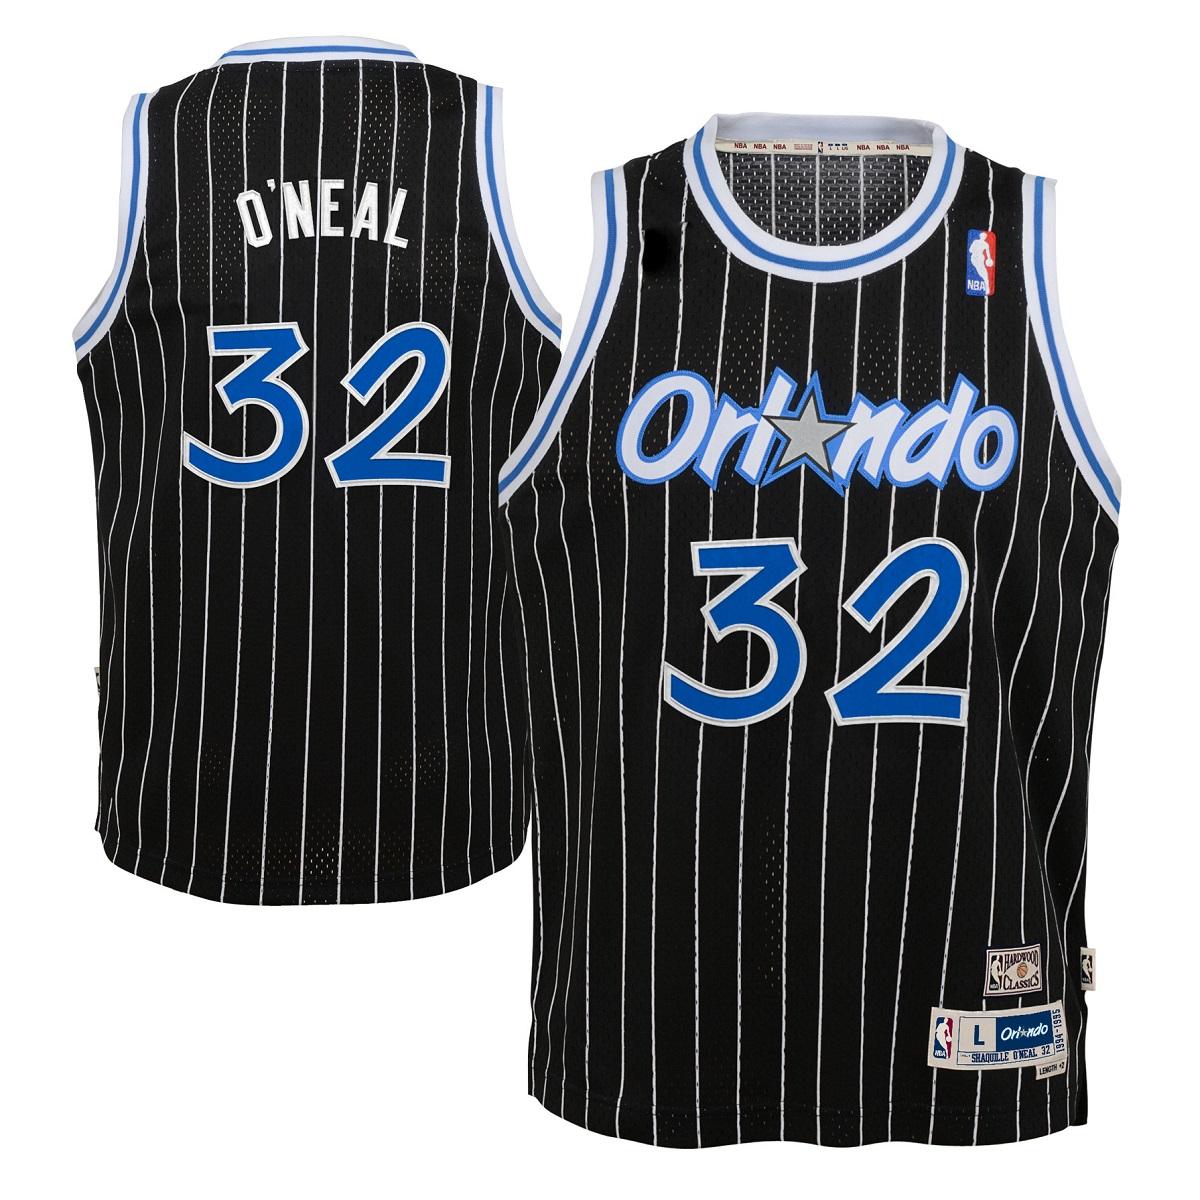 Shaquille O'Neal Orlando Magic NBA Youth Throwback Swingman Jersey - Black